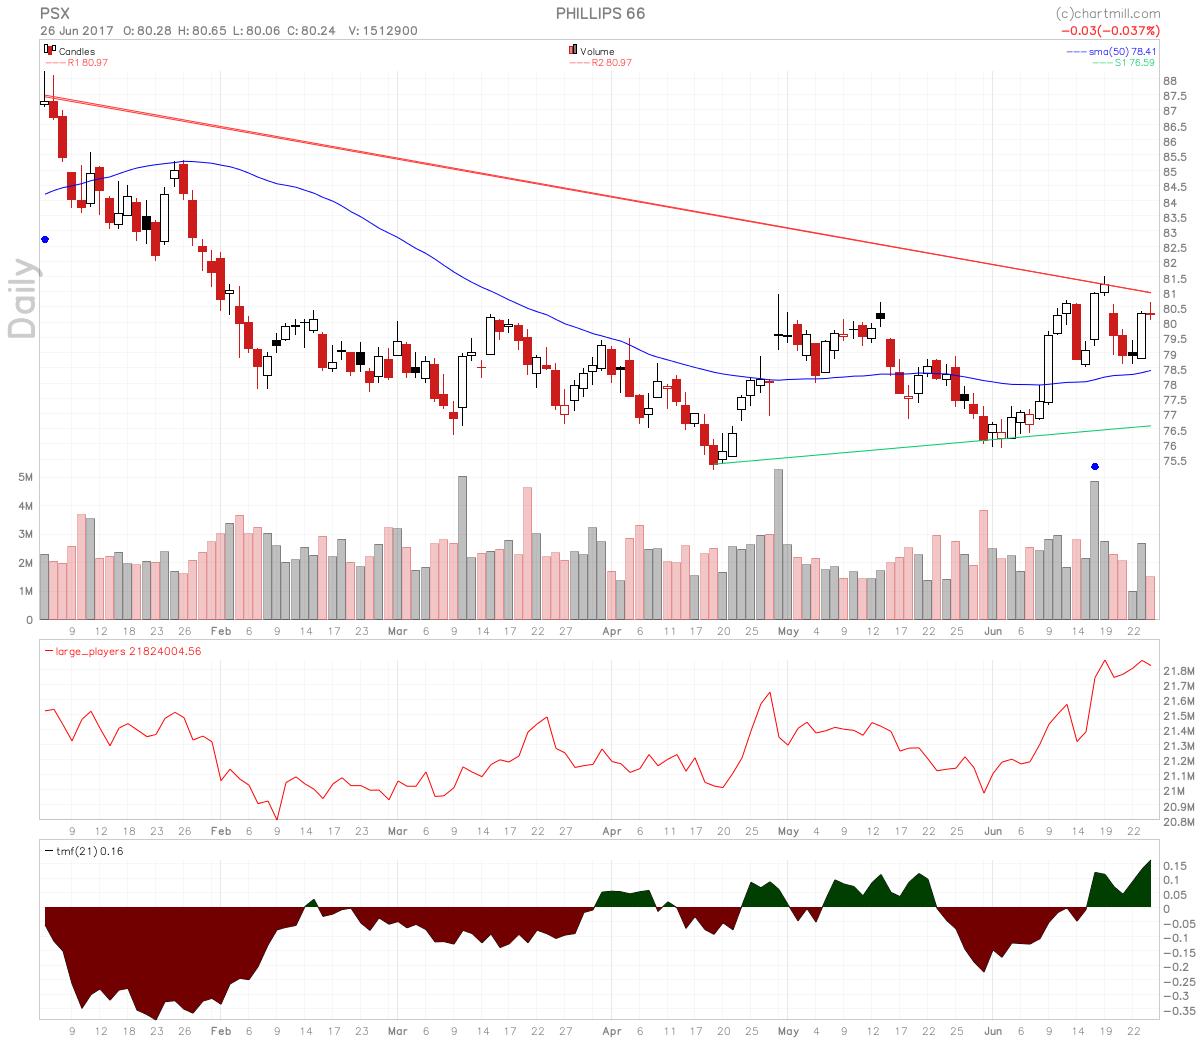 Phillips 66 Stock Price Has Good Relative Strength